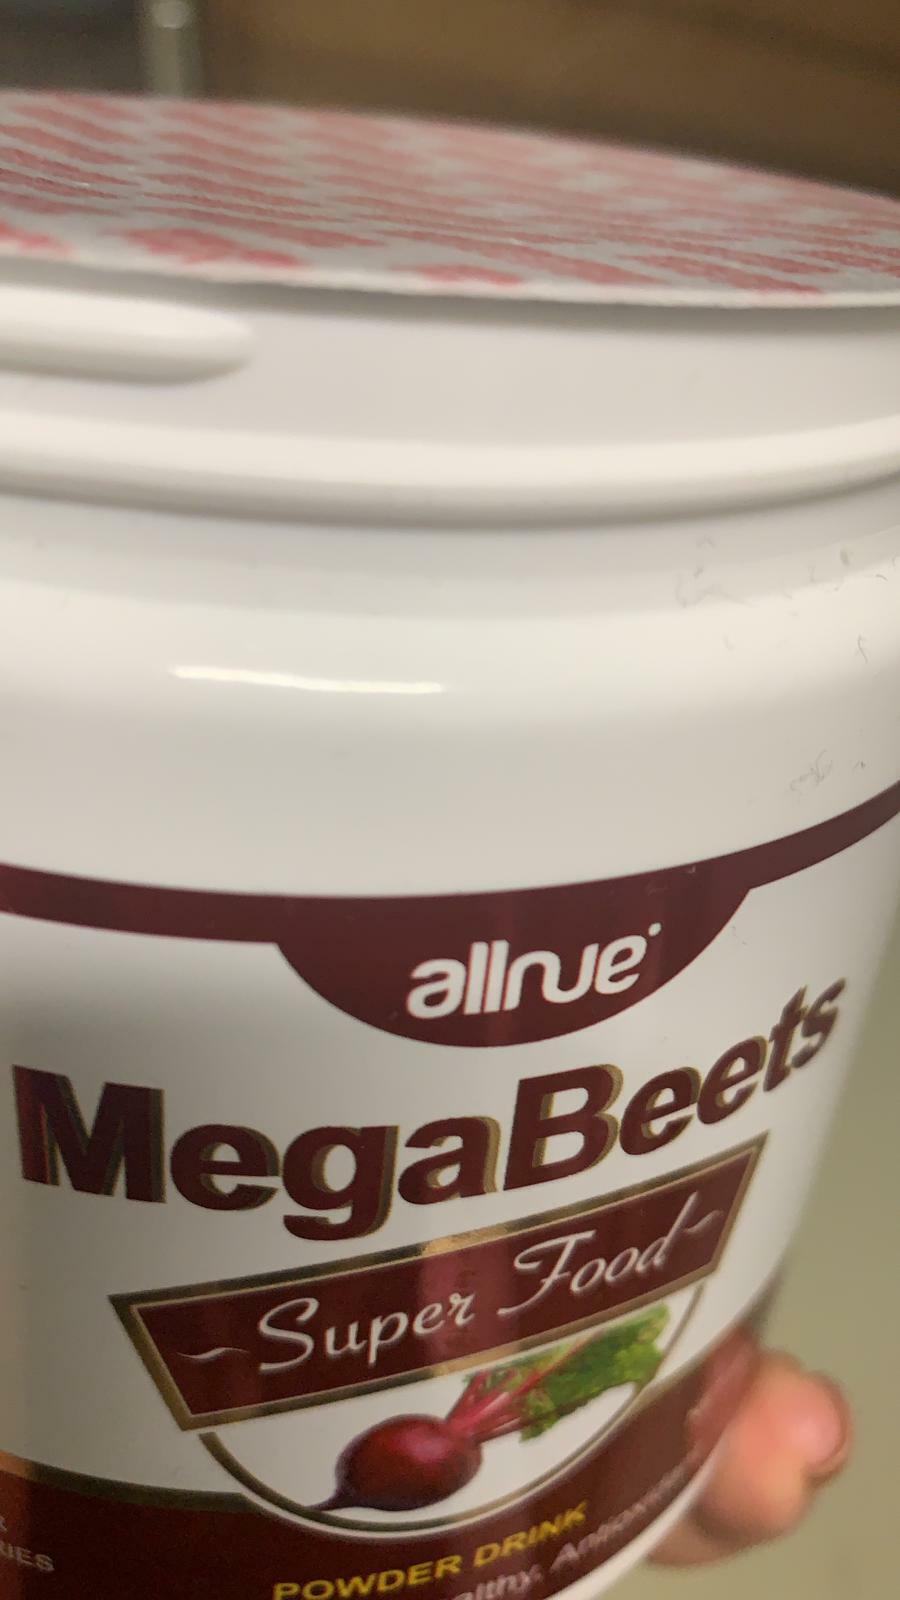 Super mega Beets Circulation Superfood  Ships FREE SAME DAY HumanN organic  4